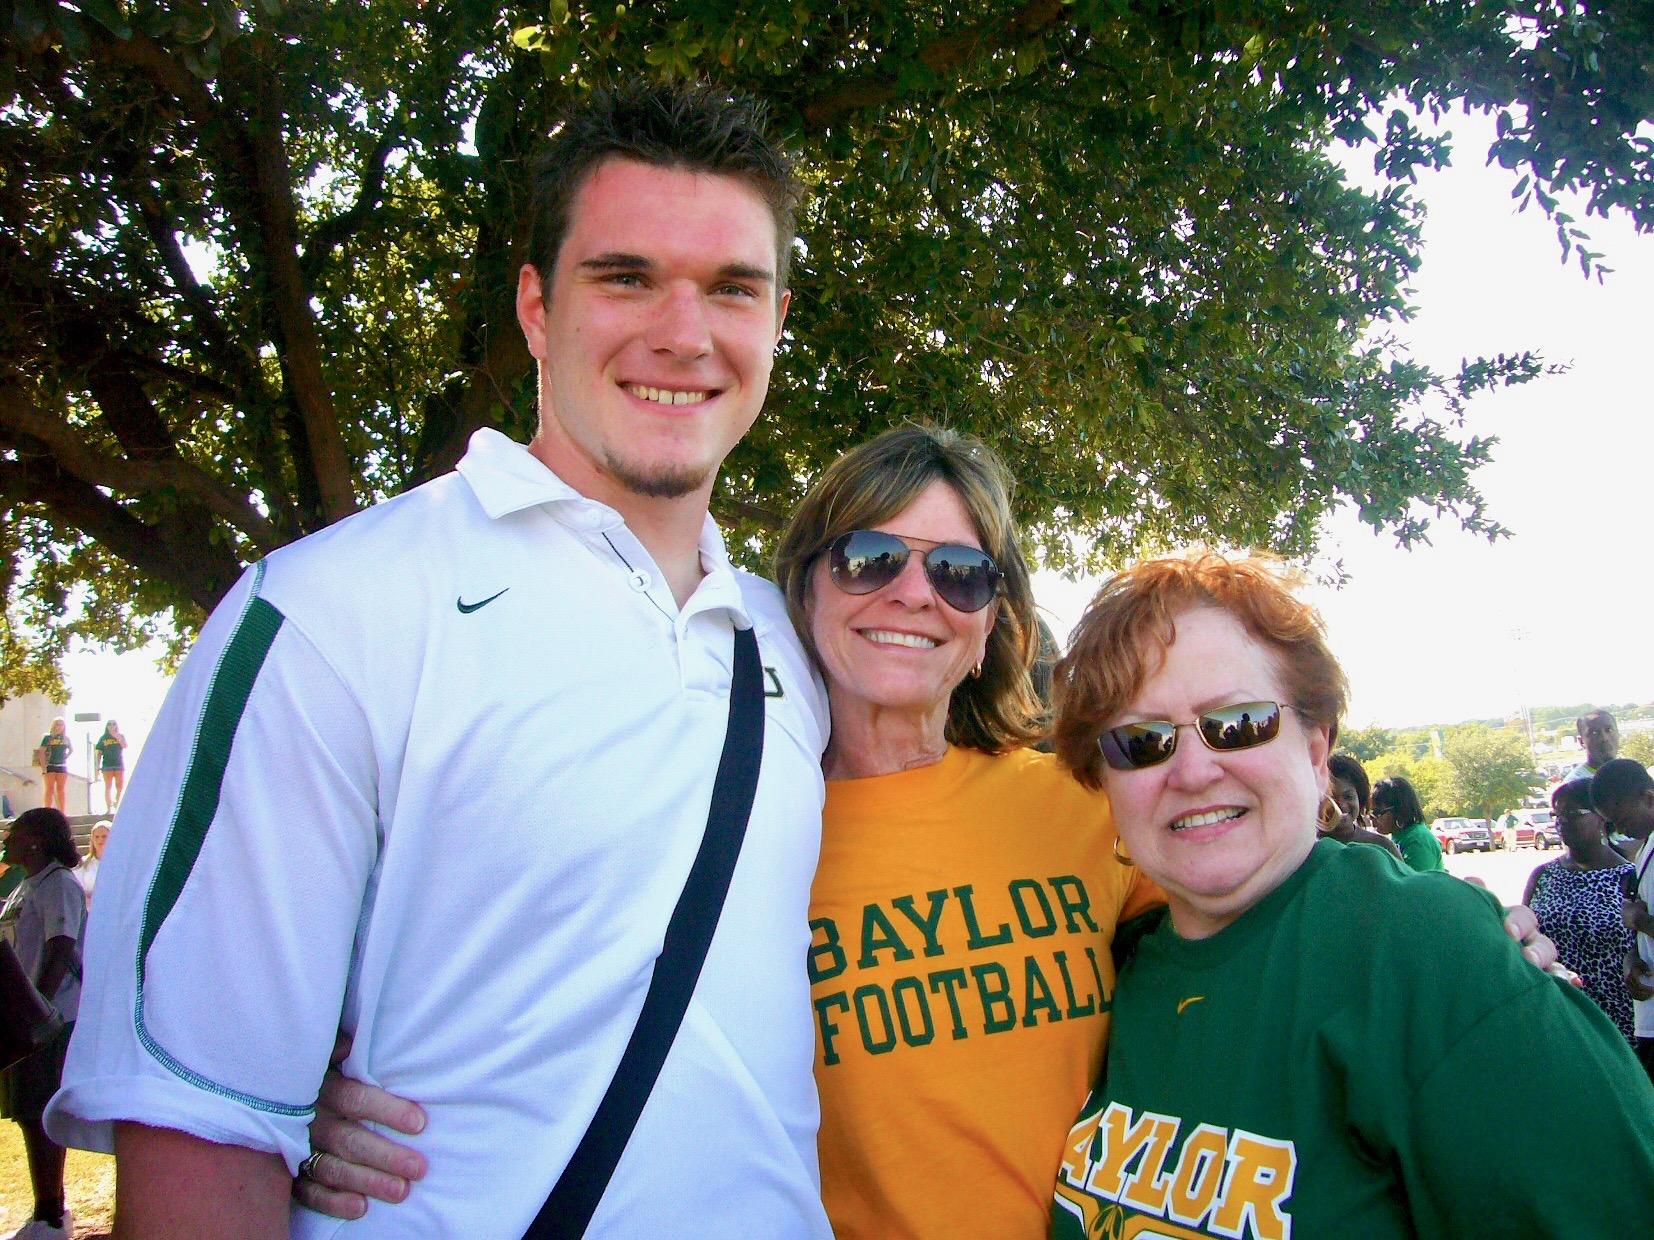 With her godson Joe and Susan Korbel